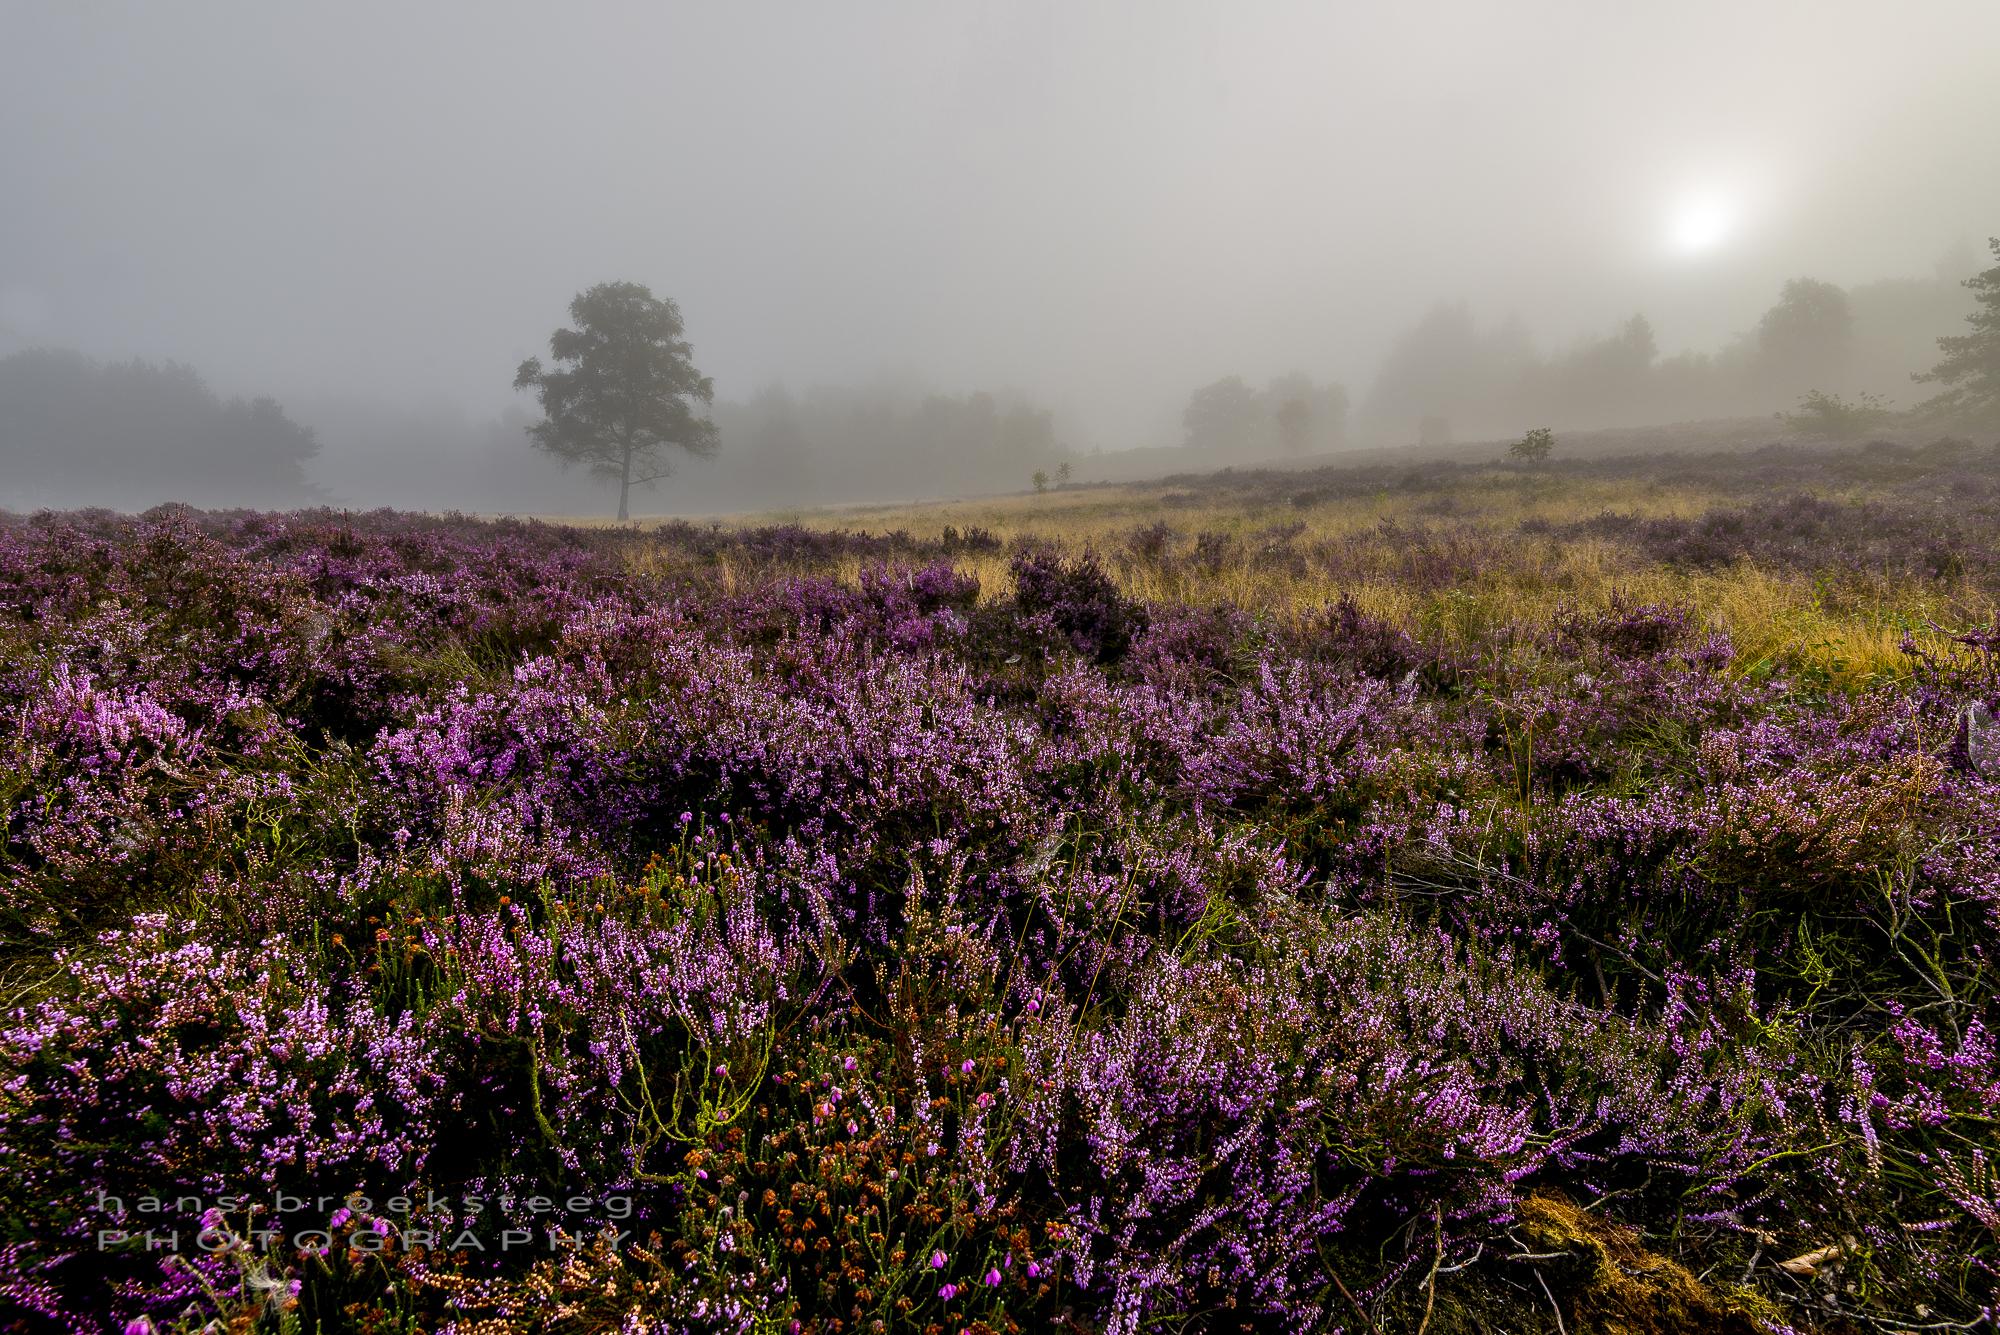 Bloming heather on a misty morning in Schaarsbergen, NL